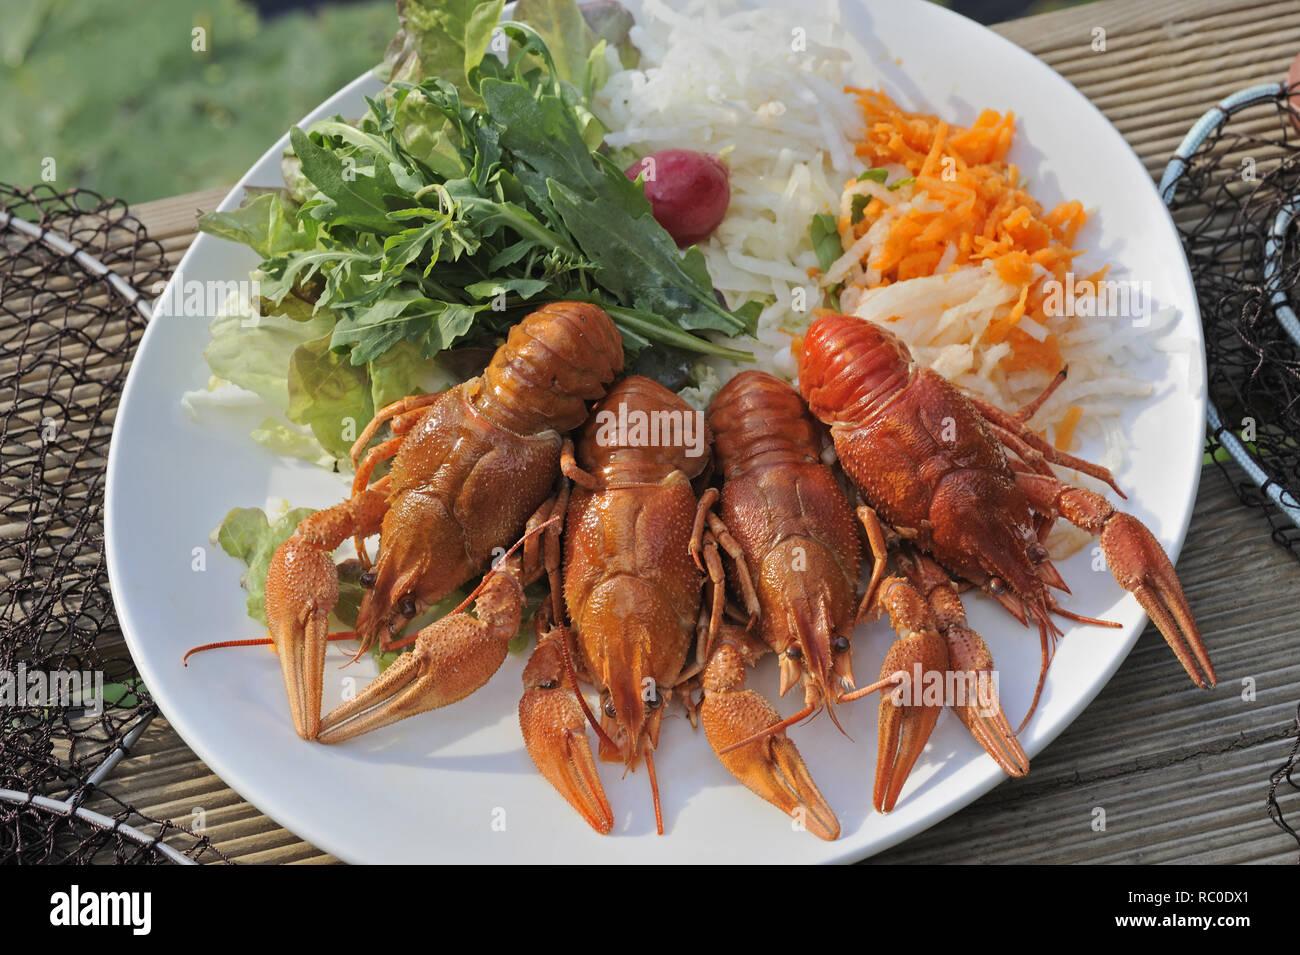 Flusskrebse mit gemischtem Salat | European crayfish, Astacus astacus,  with mixed salad, crawfish, mudbug, crawdad, crawdaddy - Stock Image